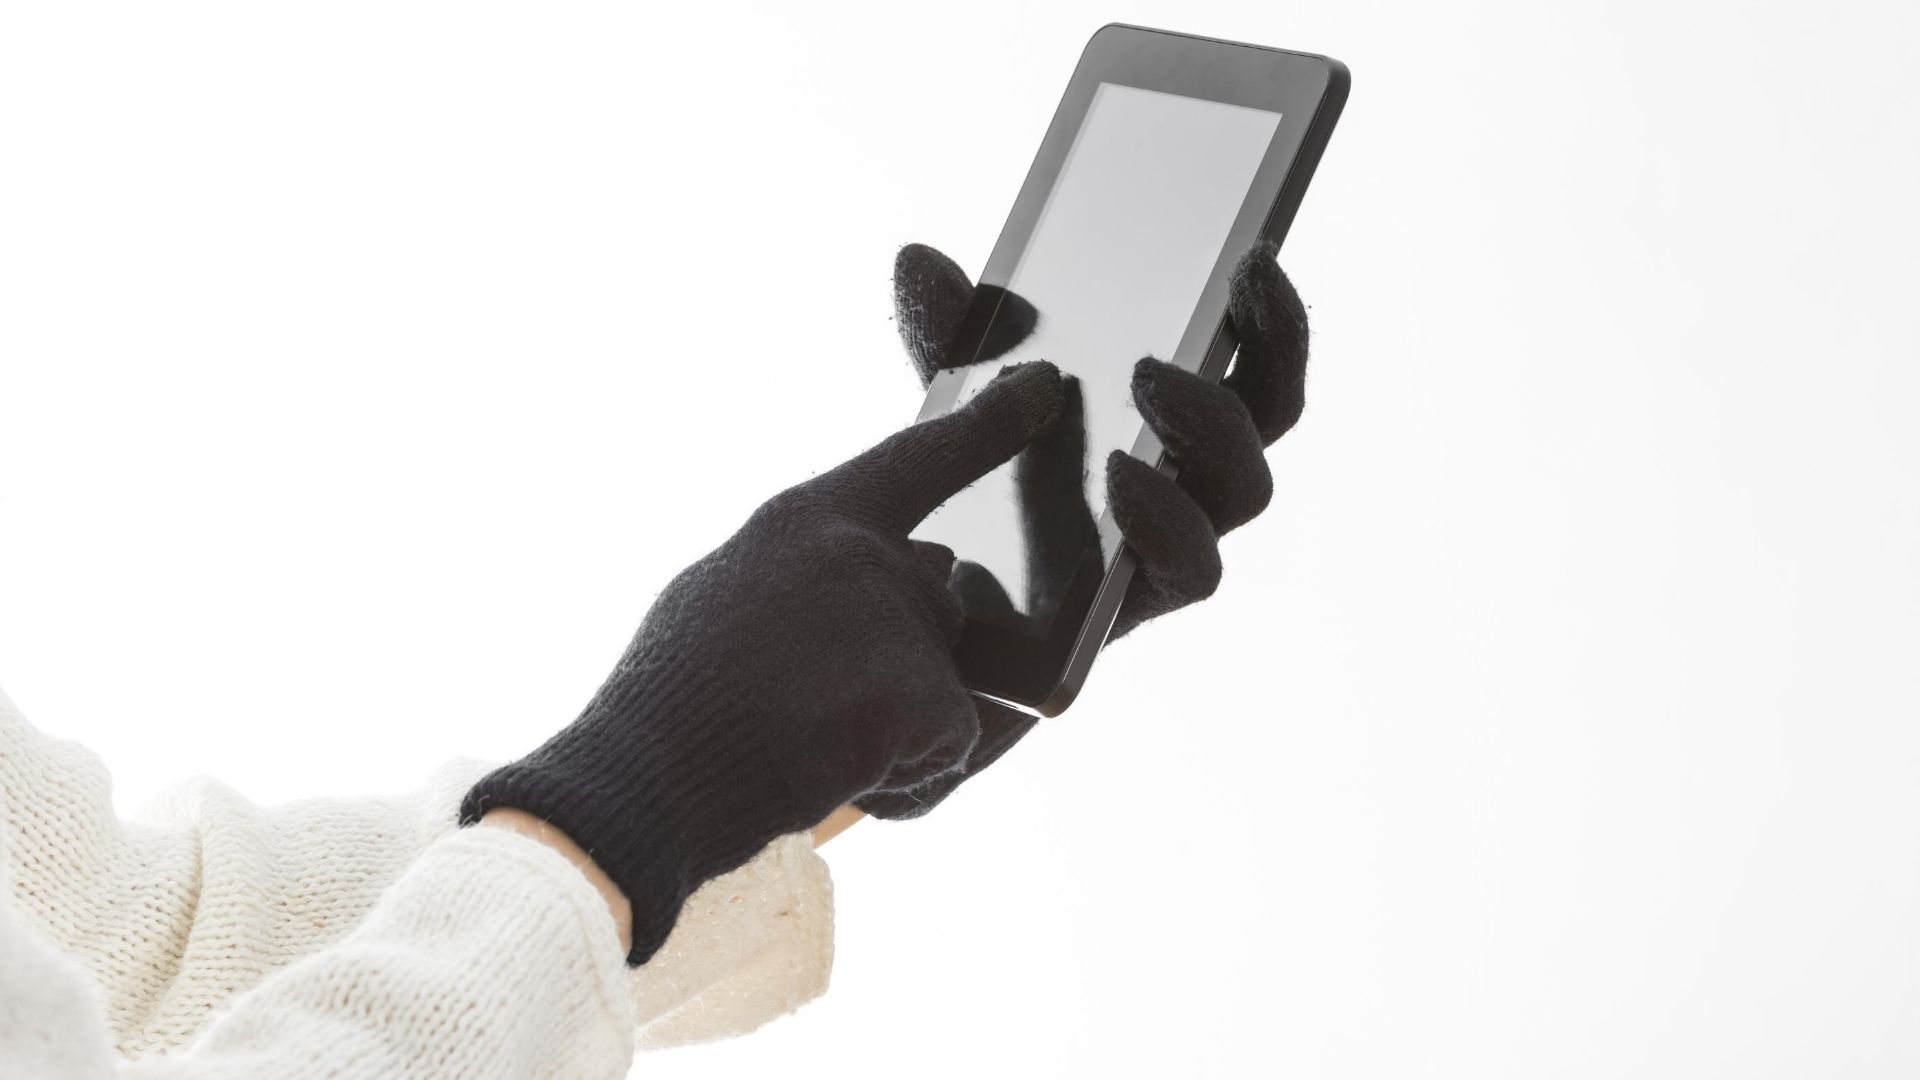 Touchscreen gloves for women.